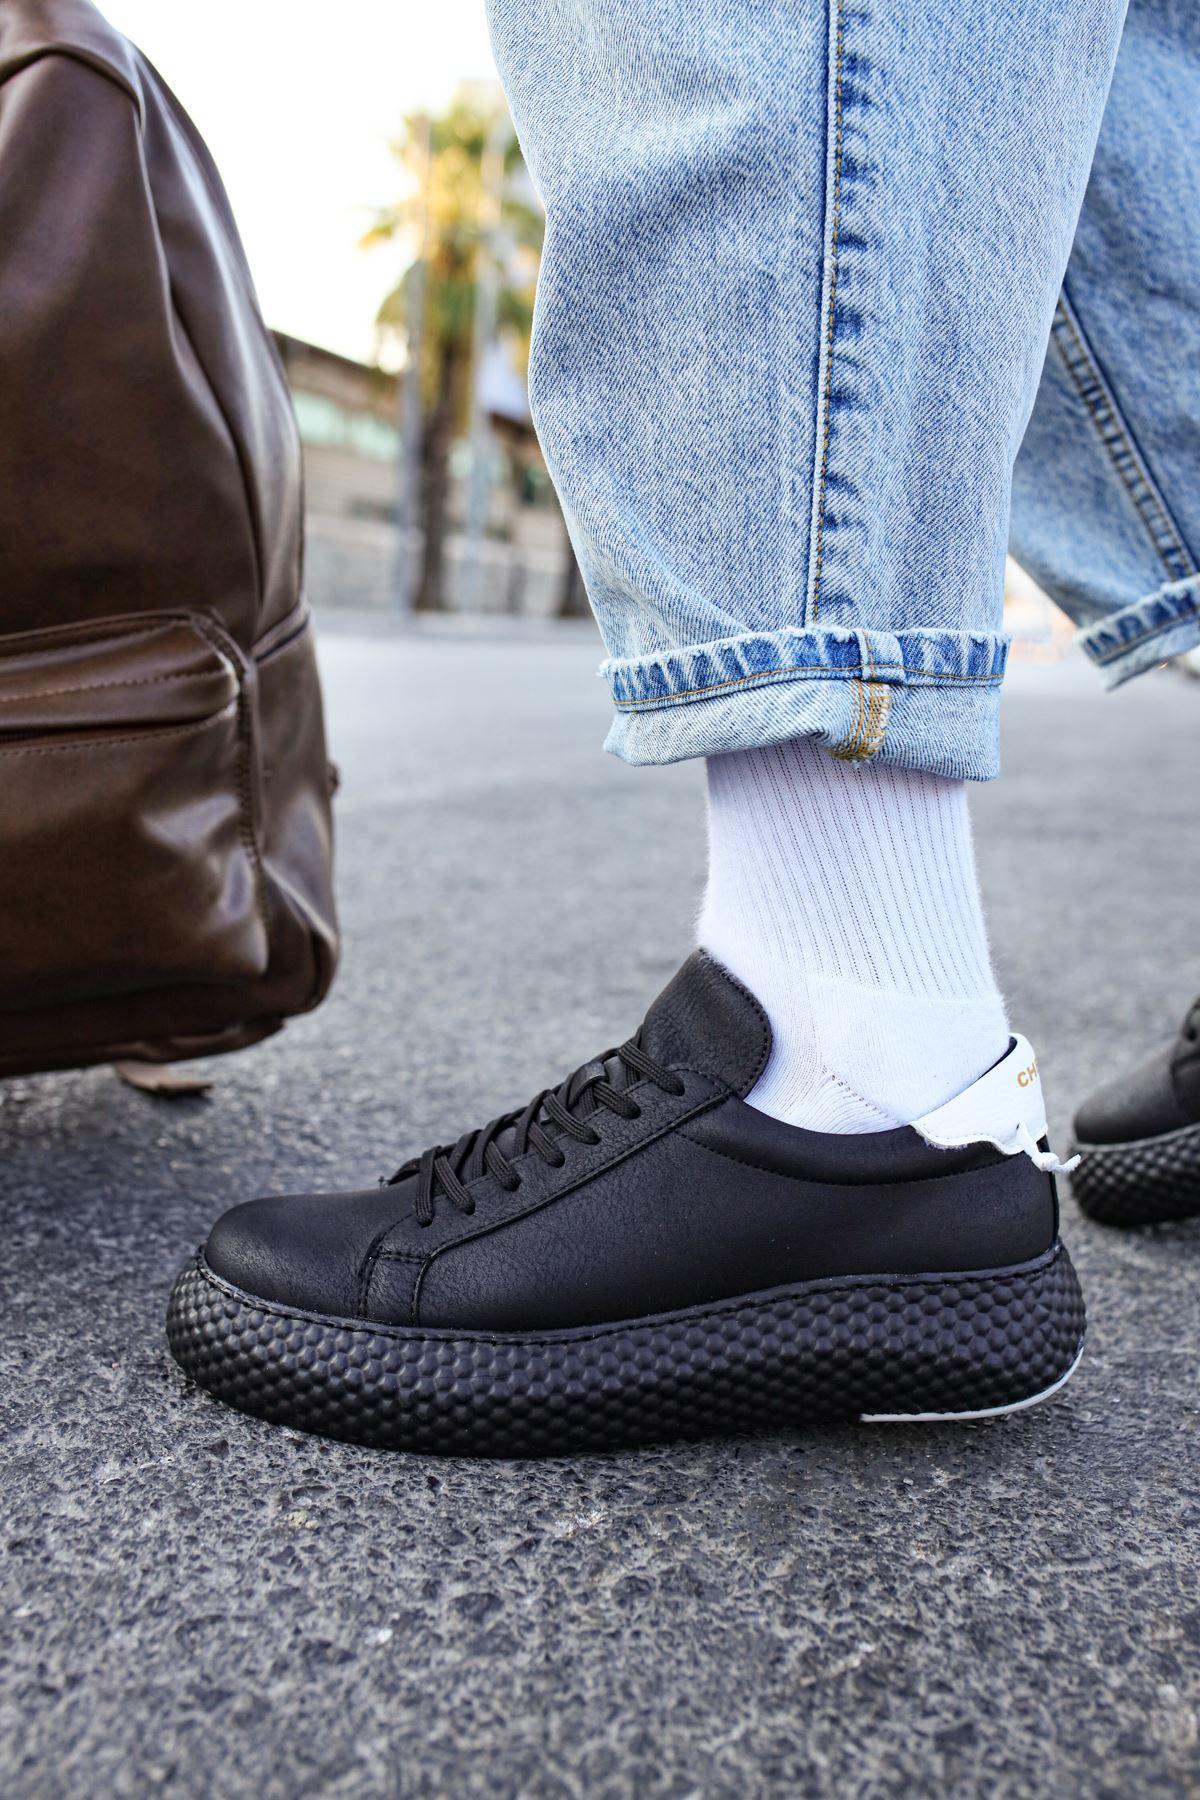 Chekich CH107 GST Erkek Ayakkabı SİYAH / BEYAZ